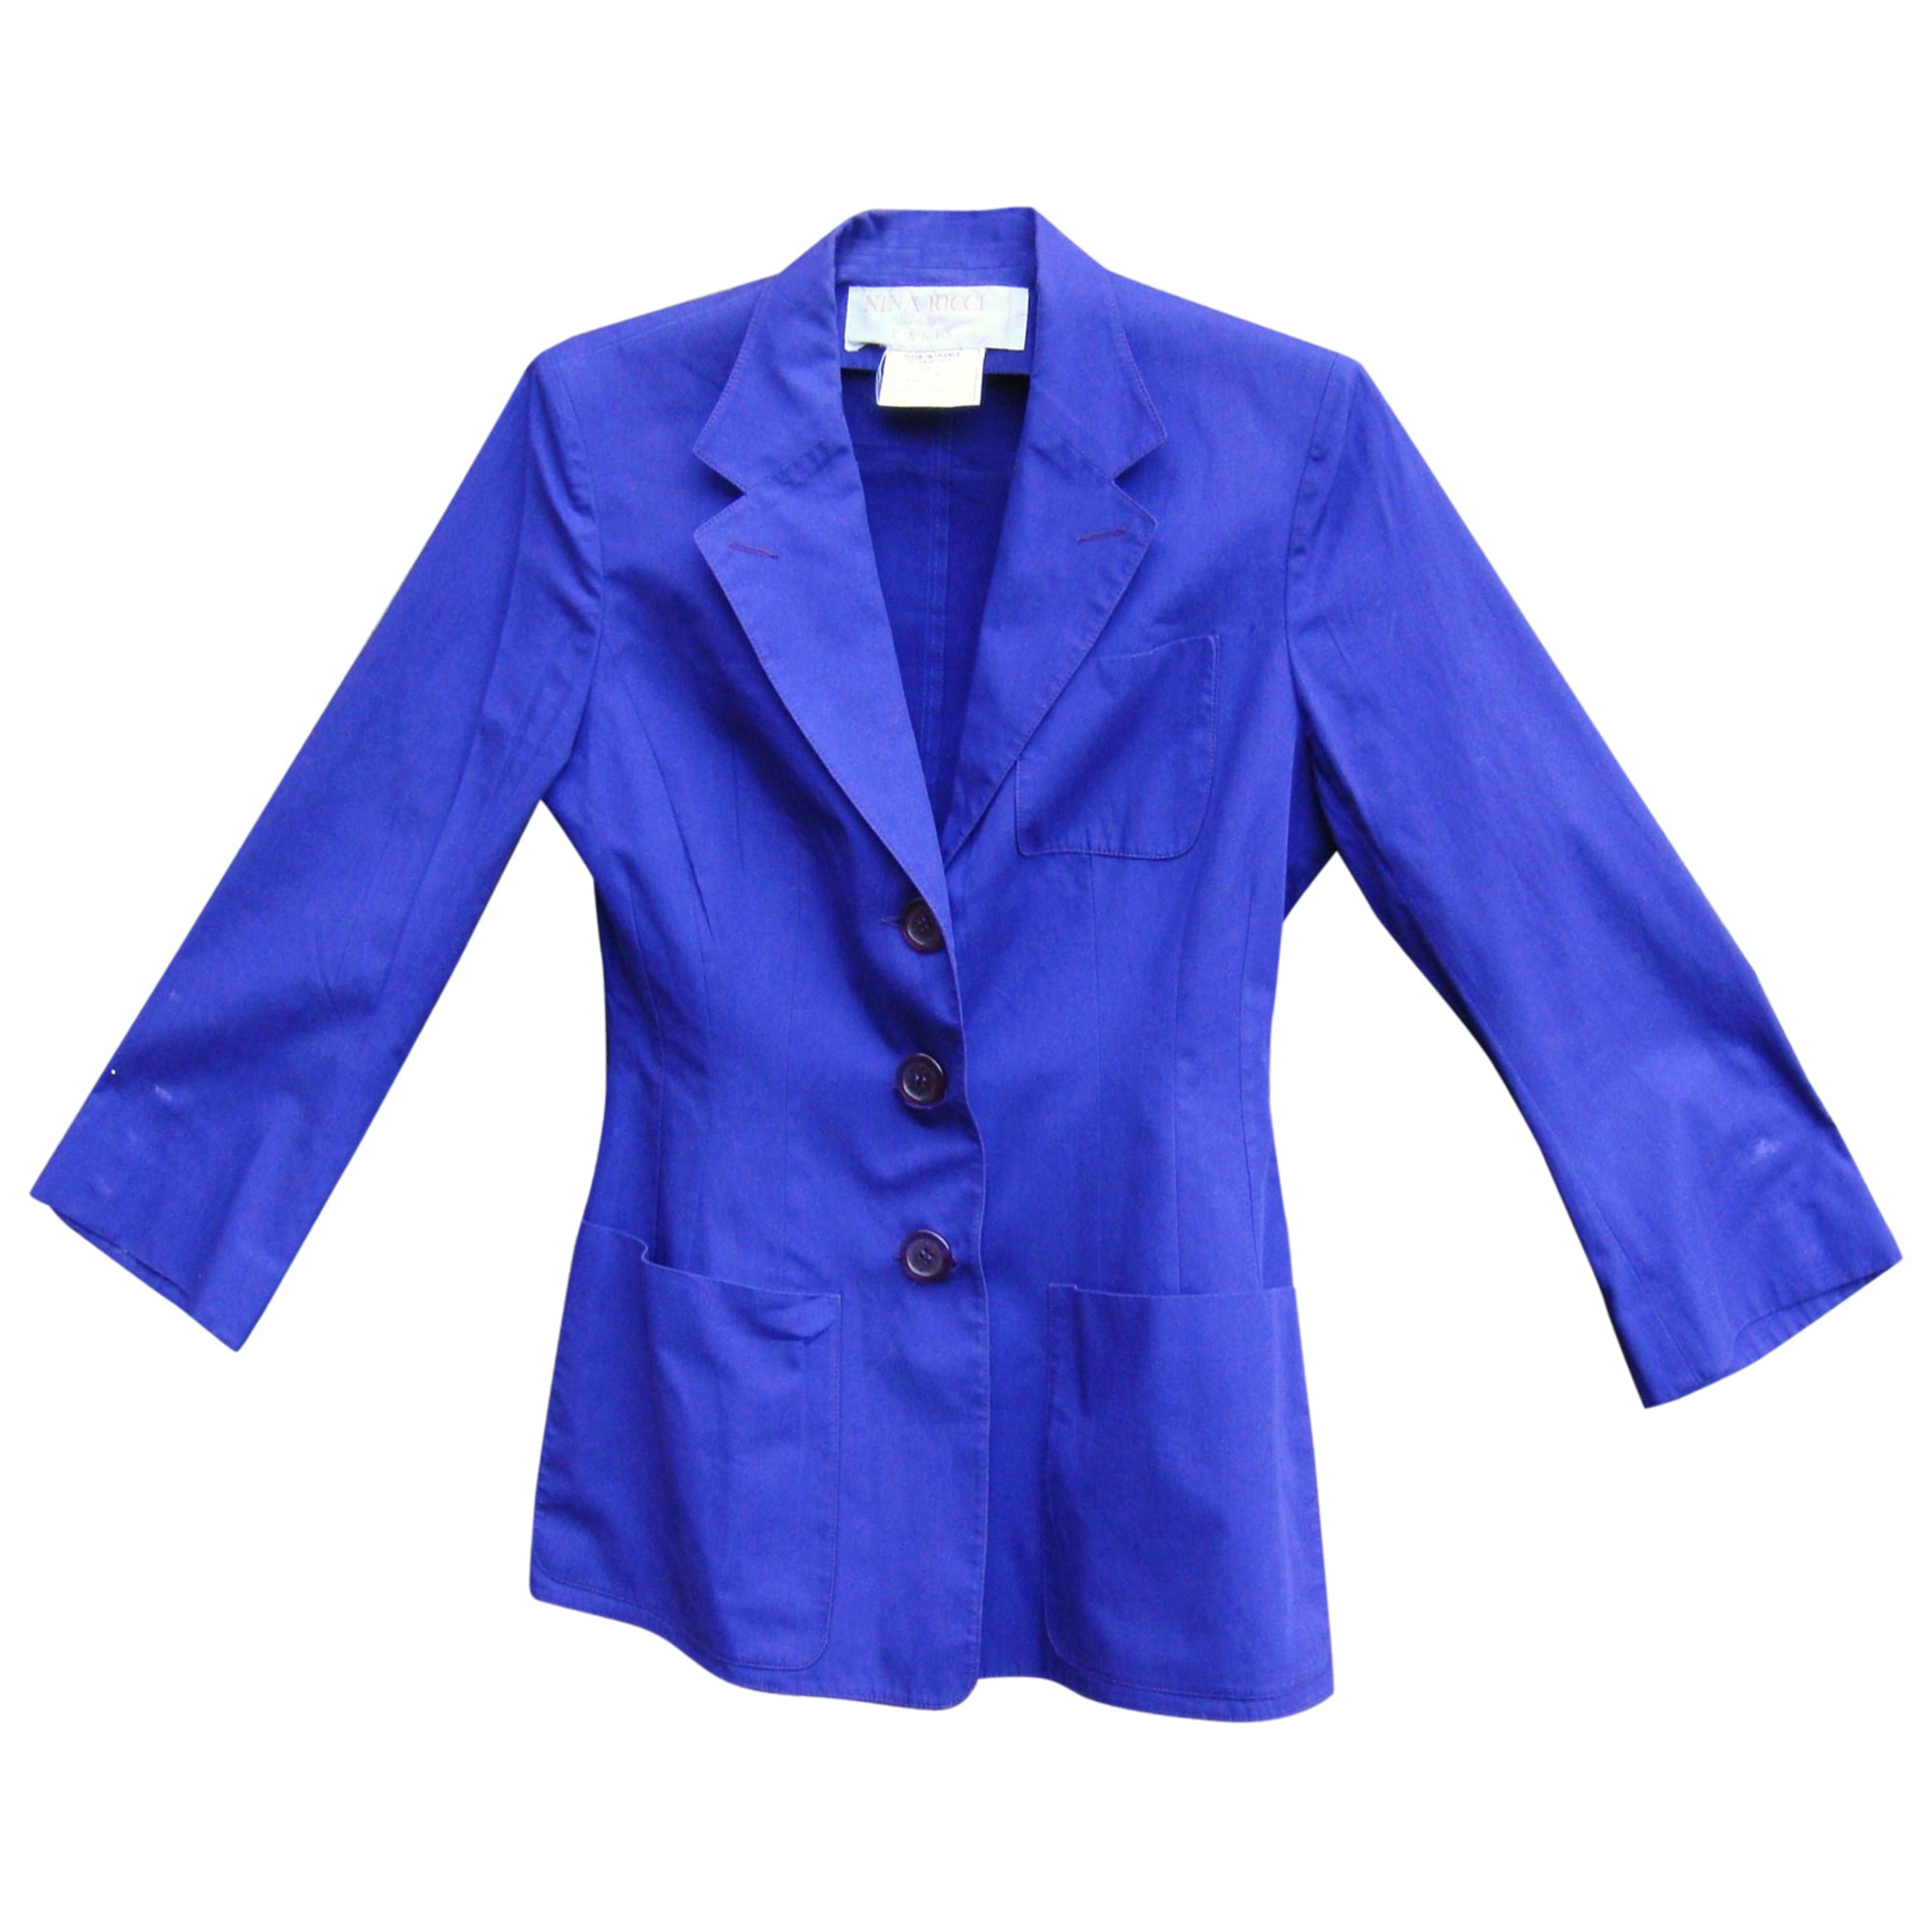 Veste NINA RICCI Bleu, bleu marine, bleu turquoise